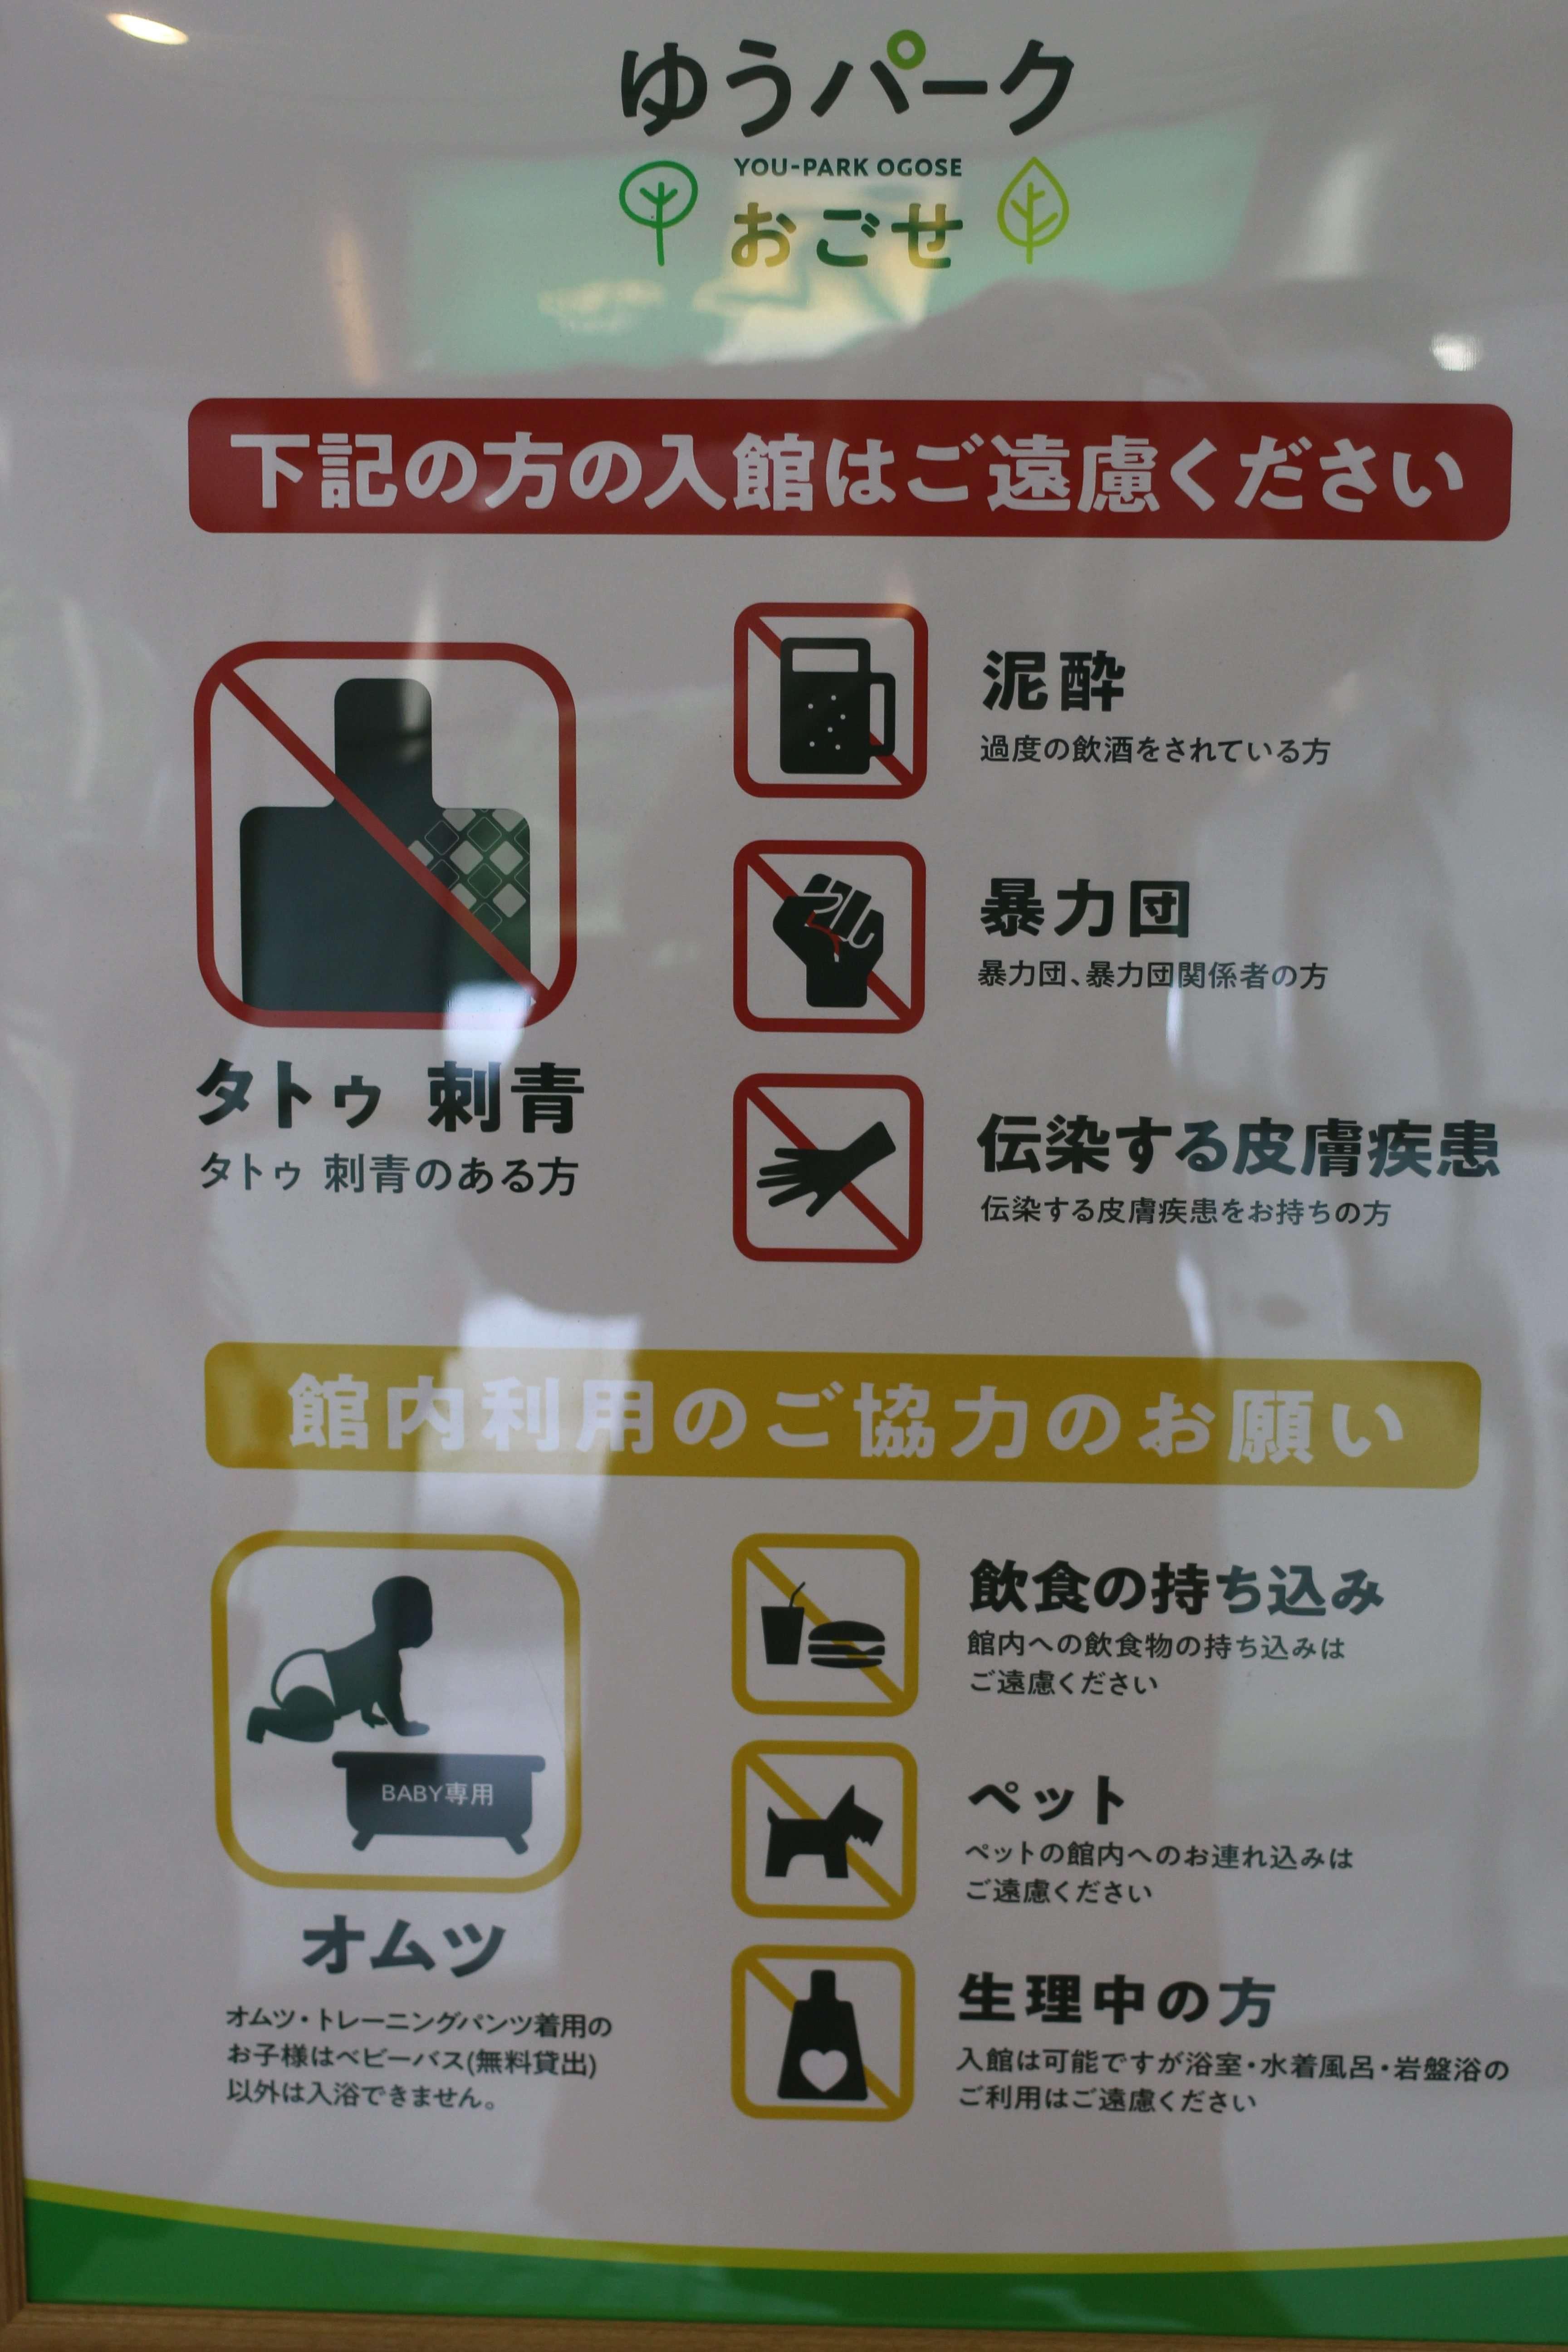 You Park Ogose bath conditions